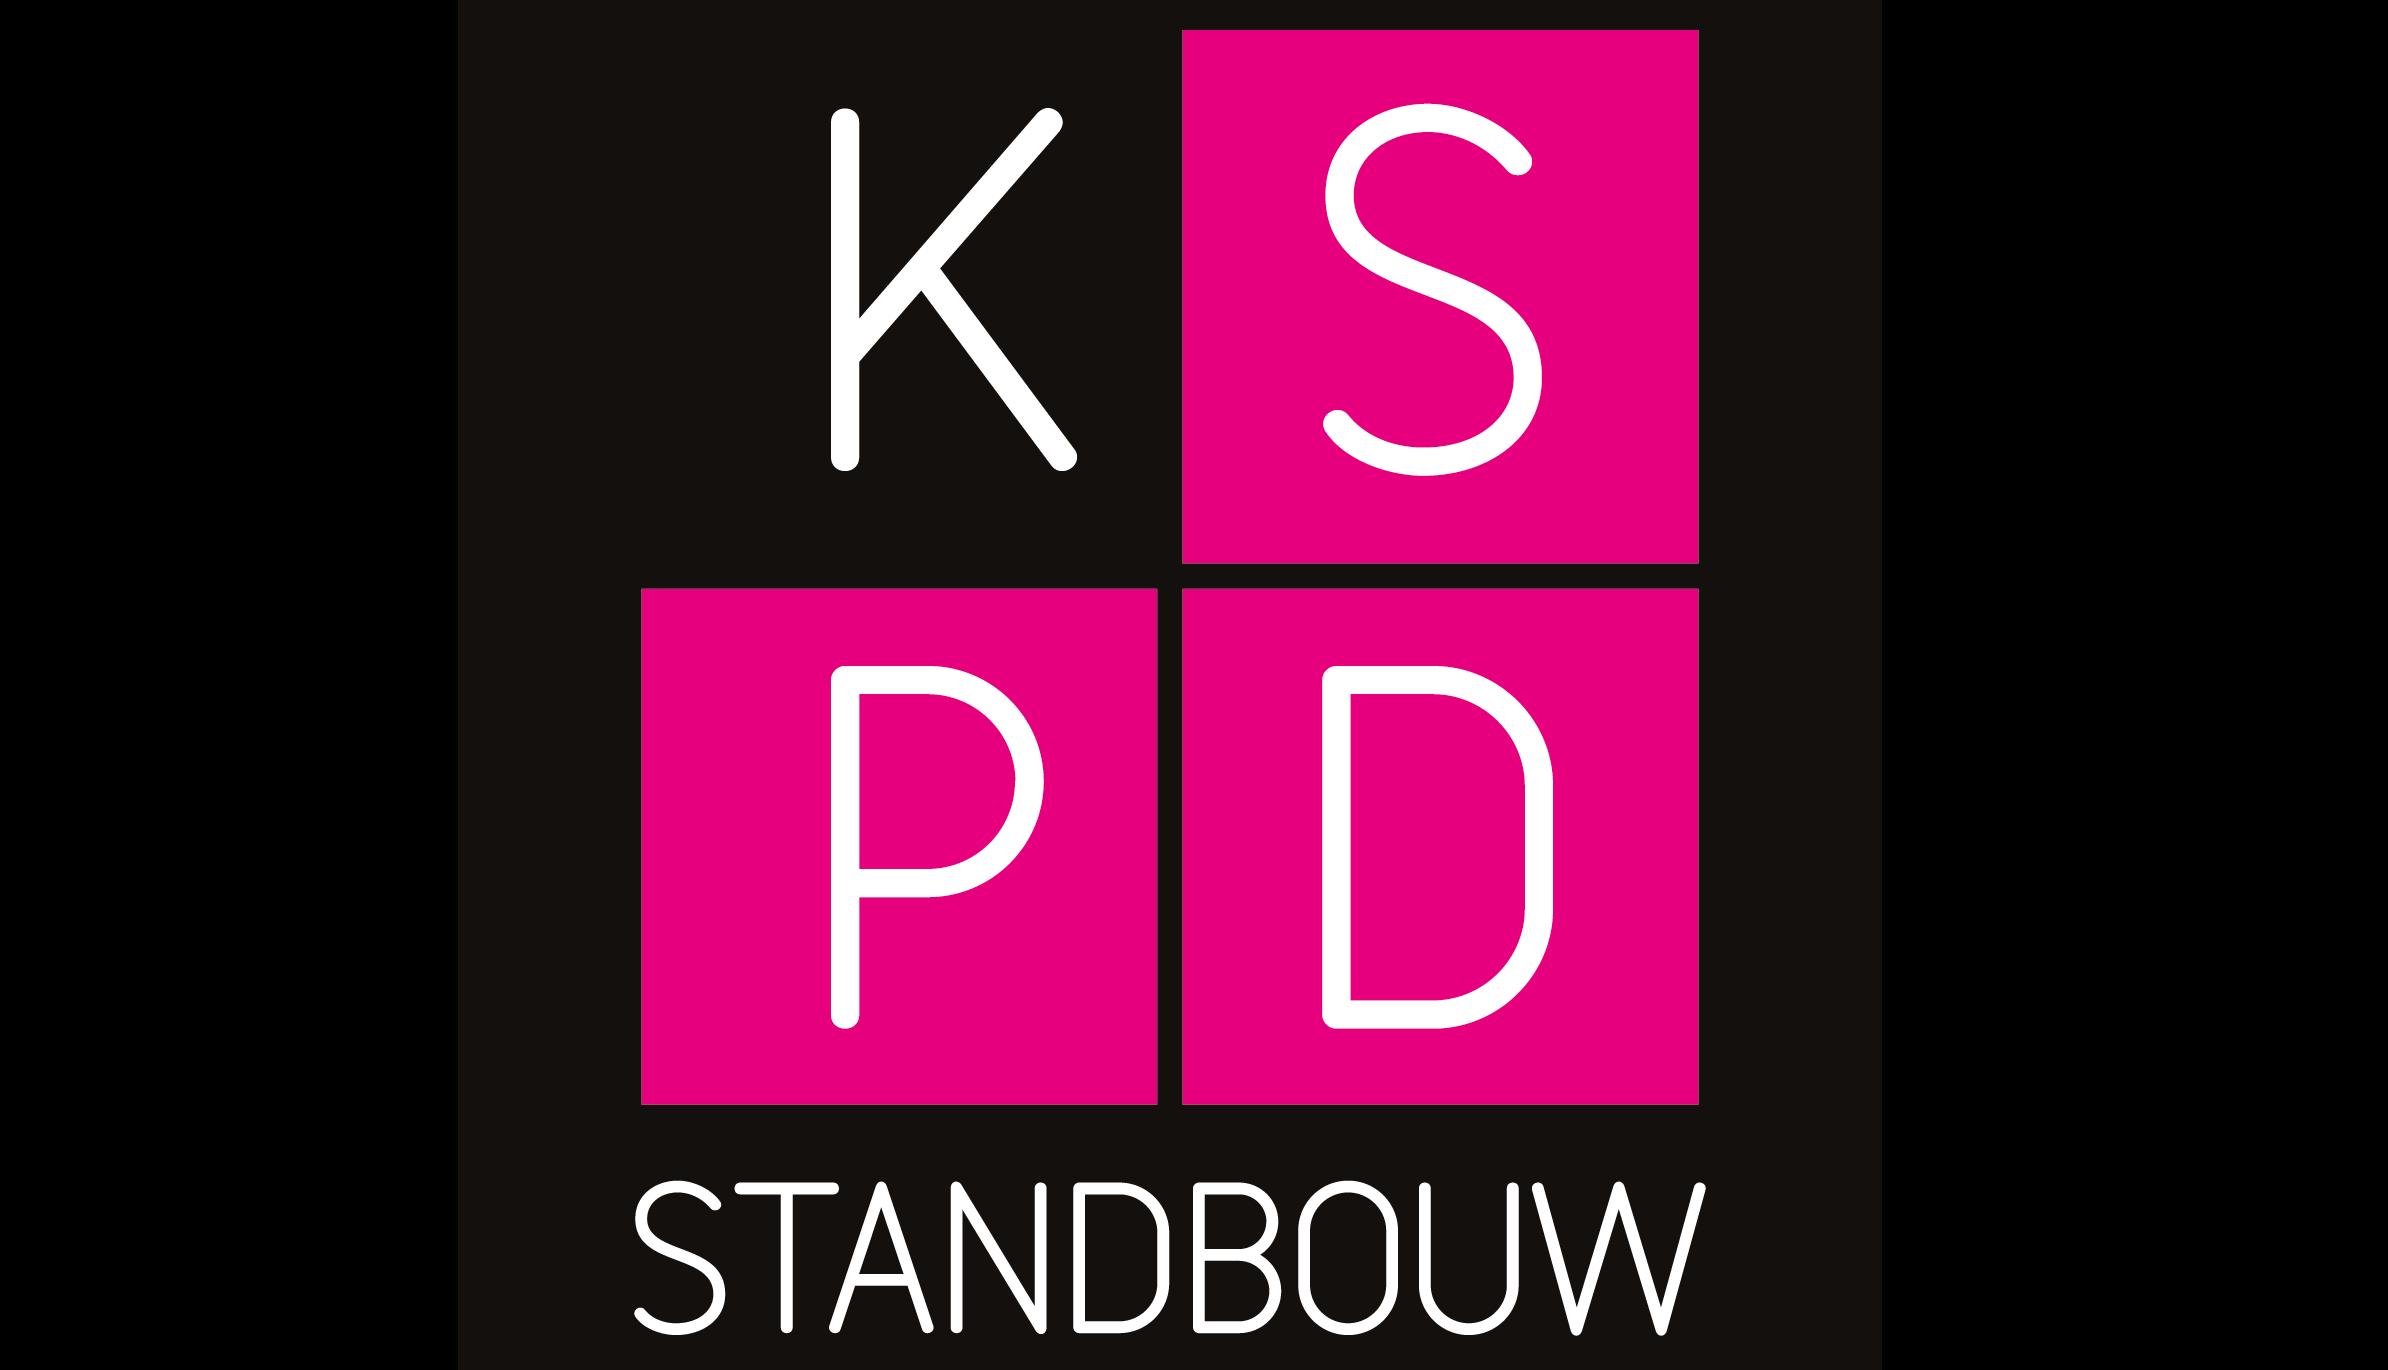 Kspd logo